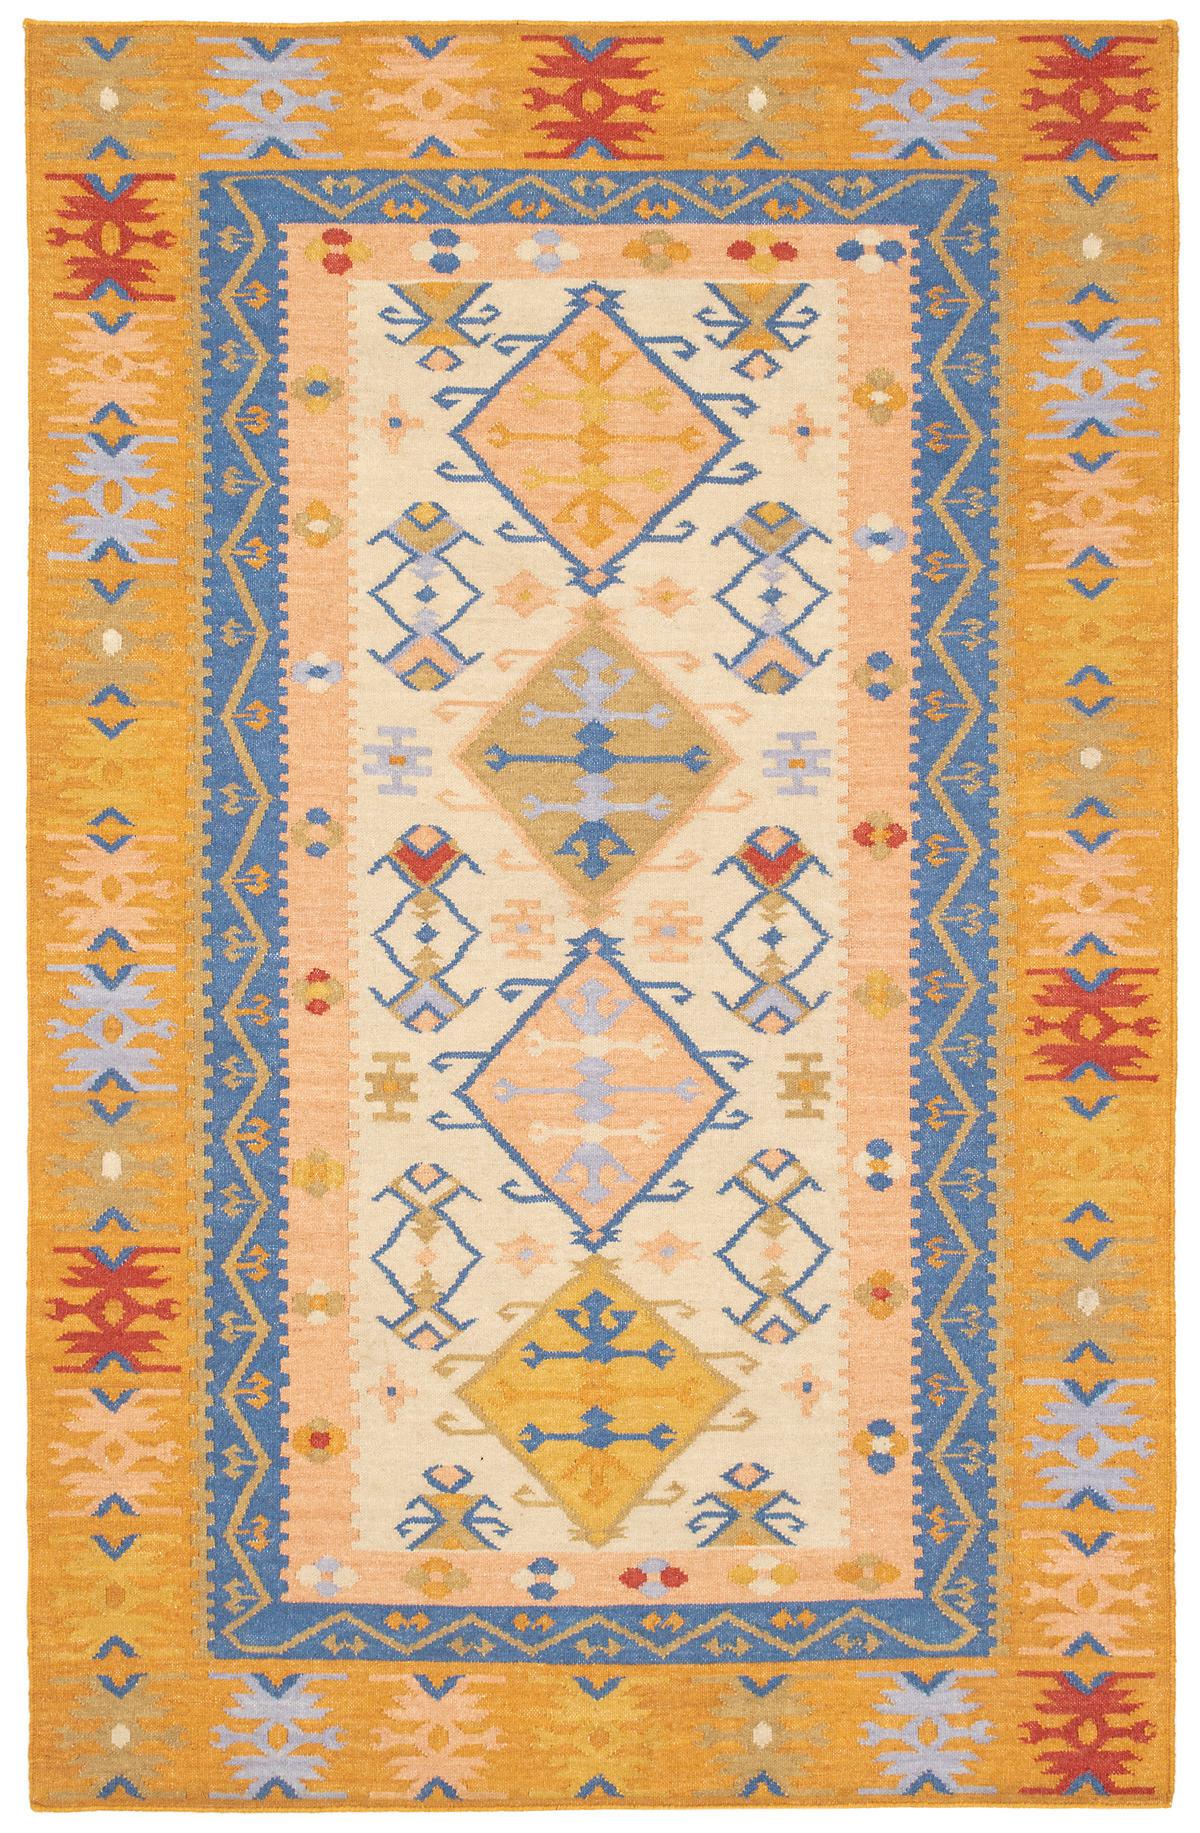 Solstice Kilim Woven Wool Rug